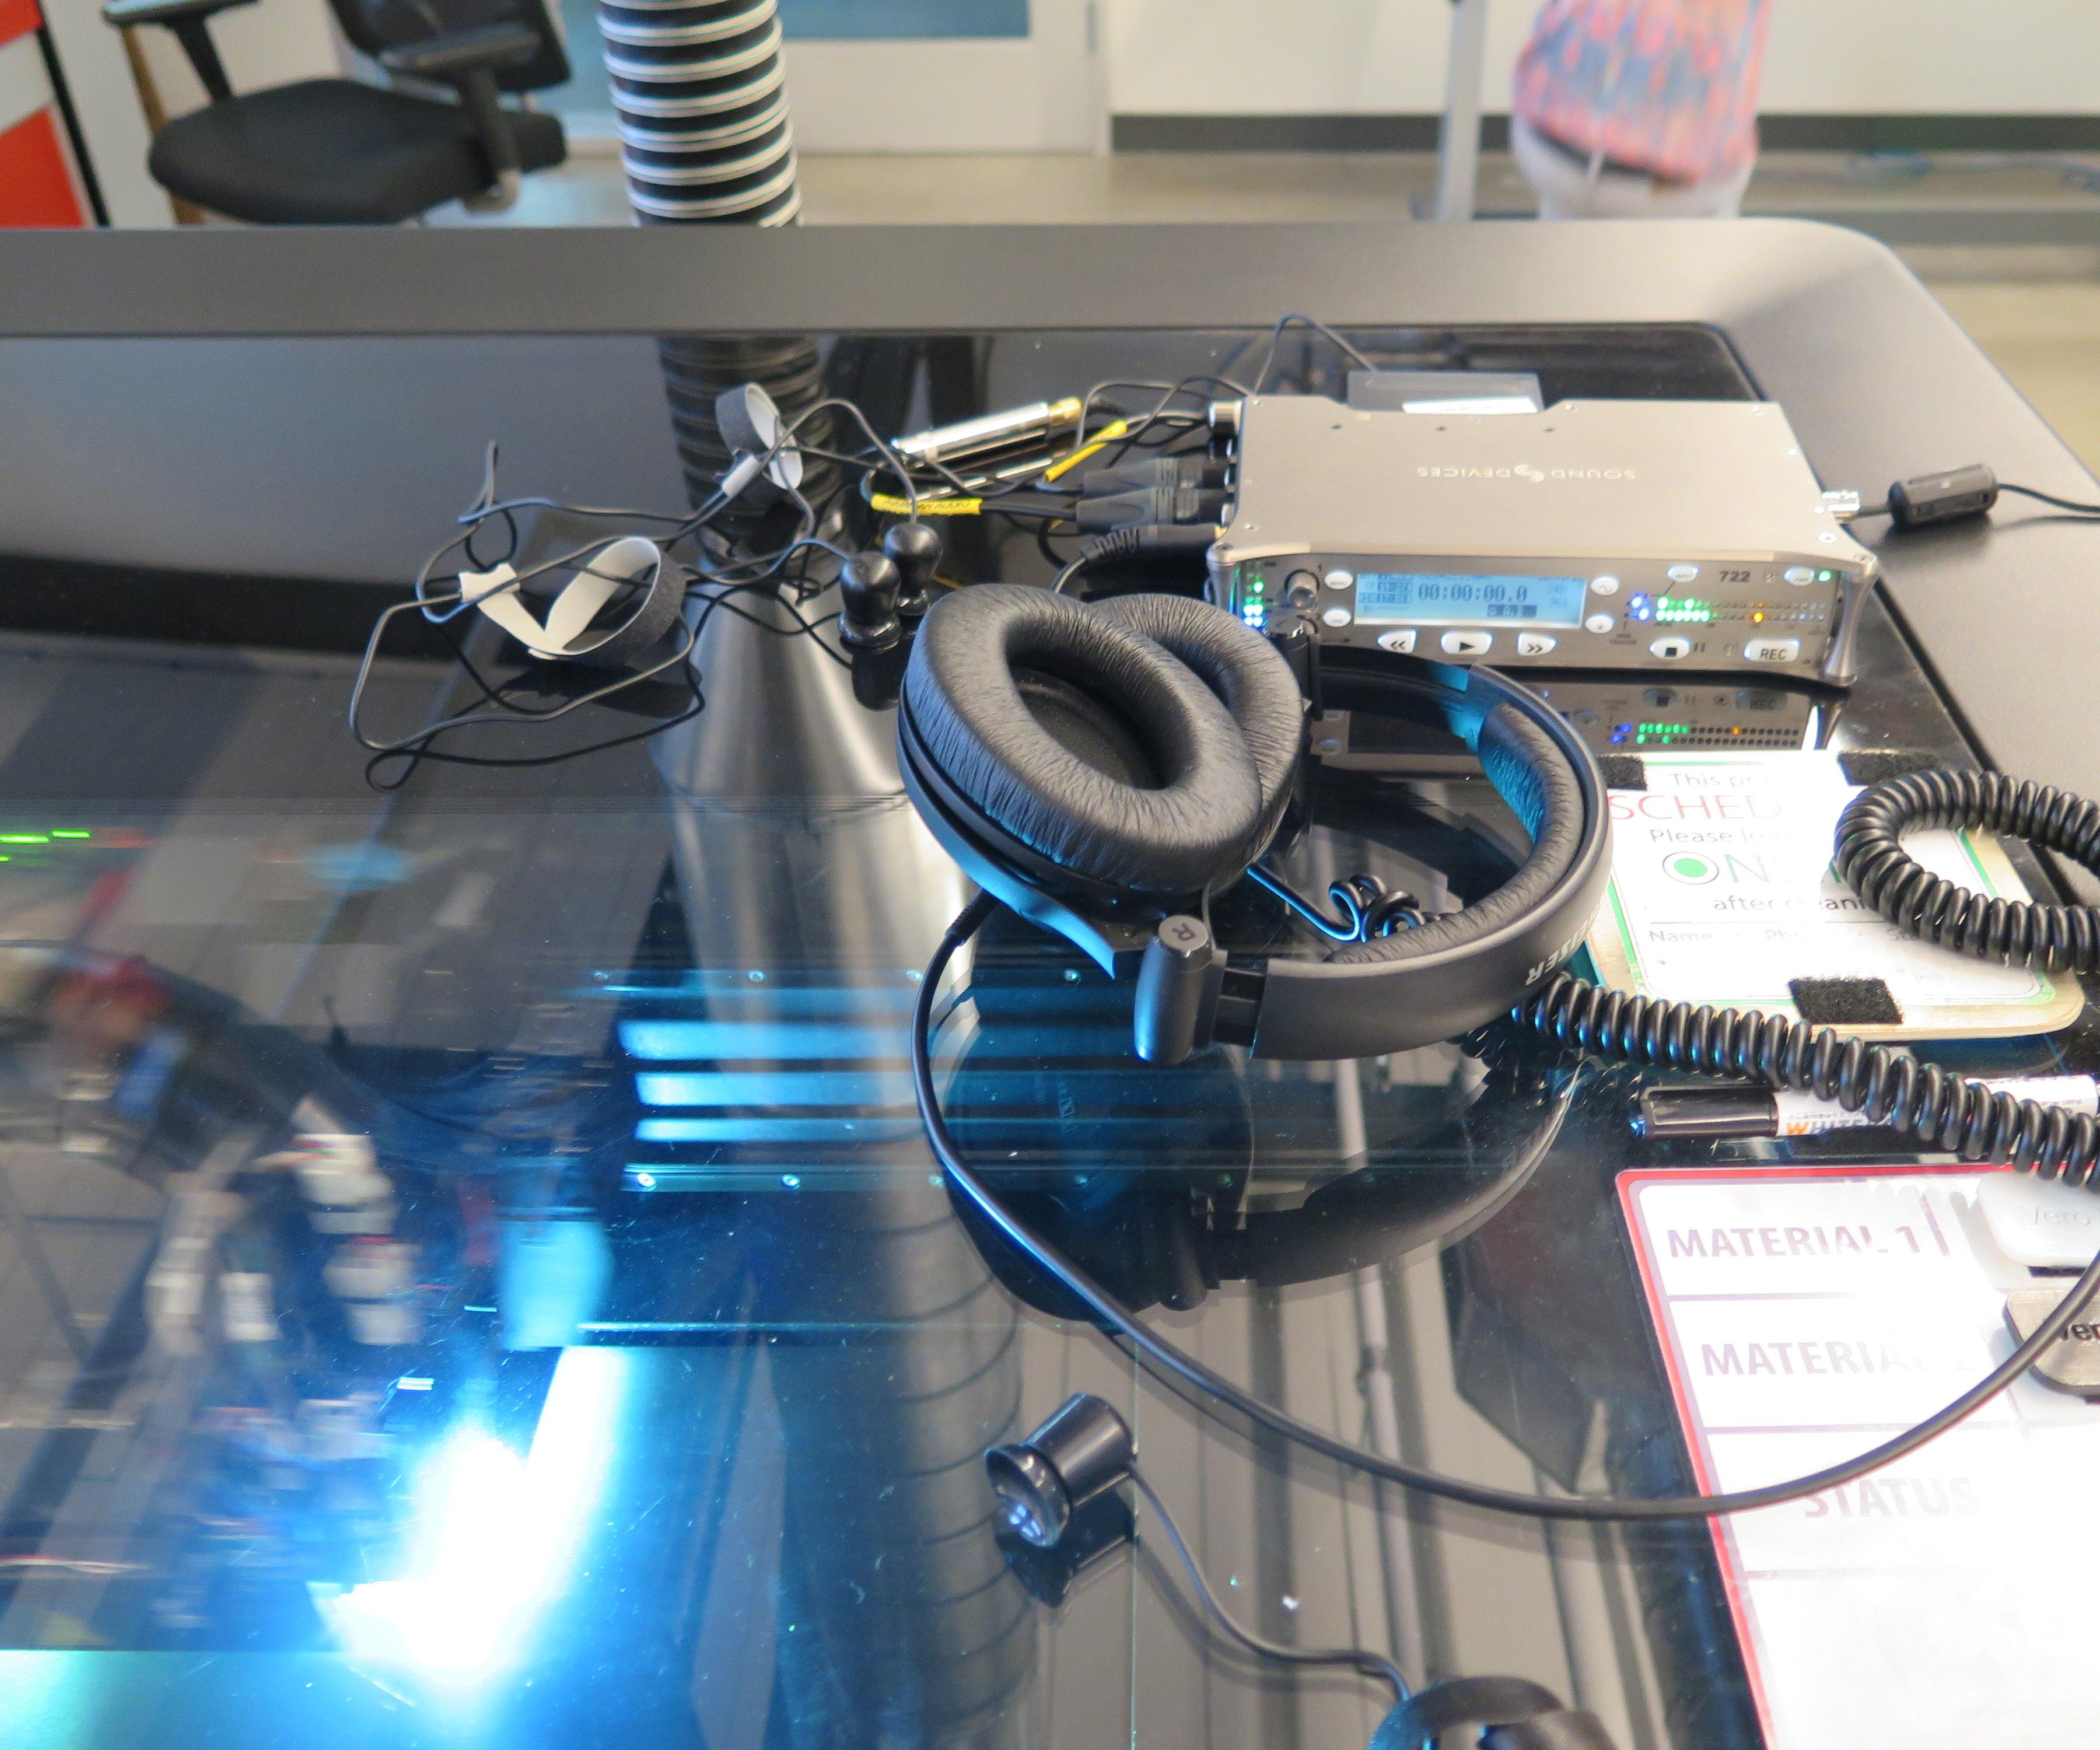 Industrial ASMR: Mining an Objet 3D Printer for Sound